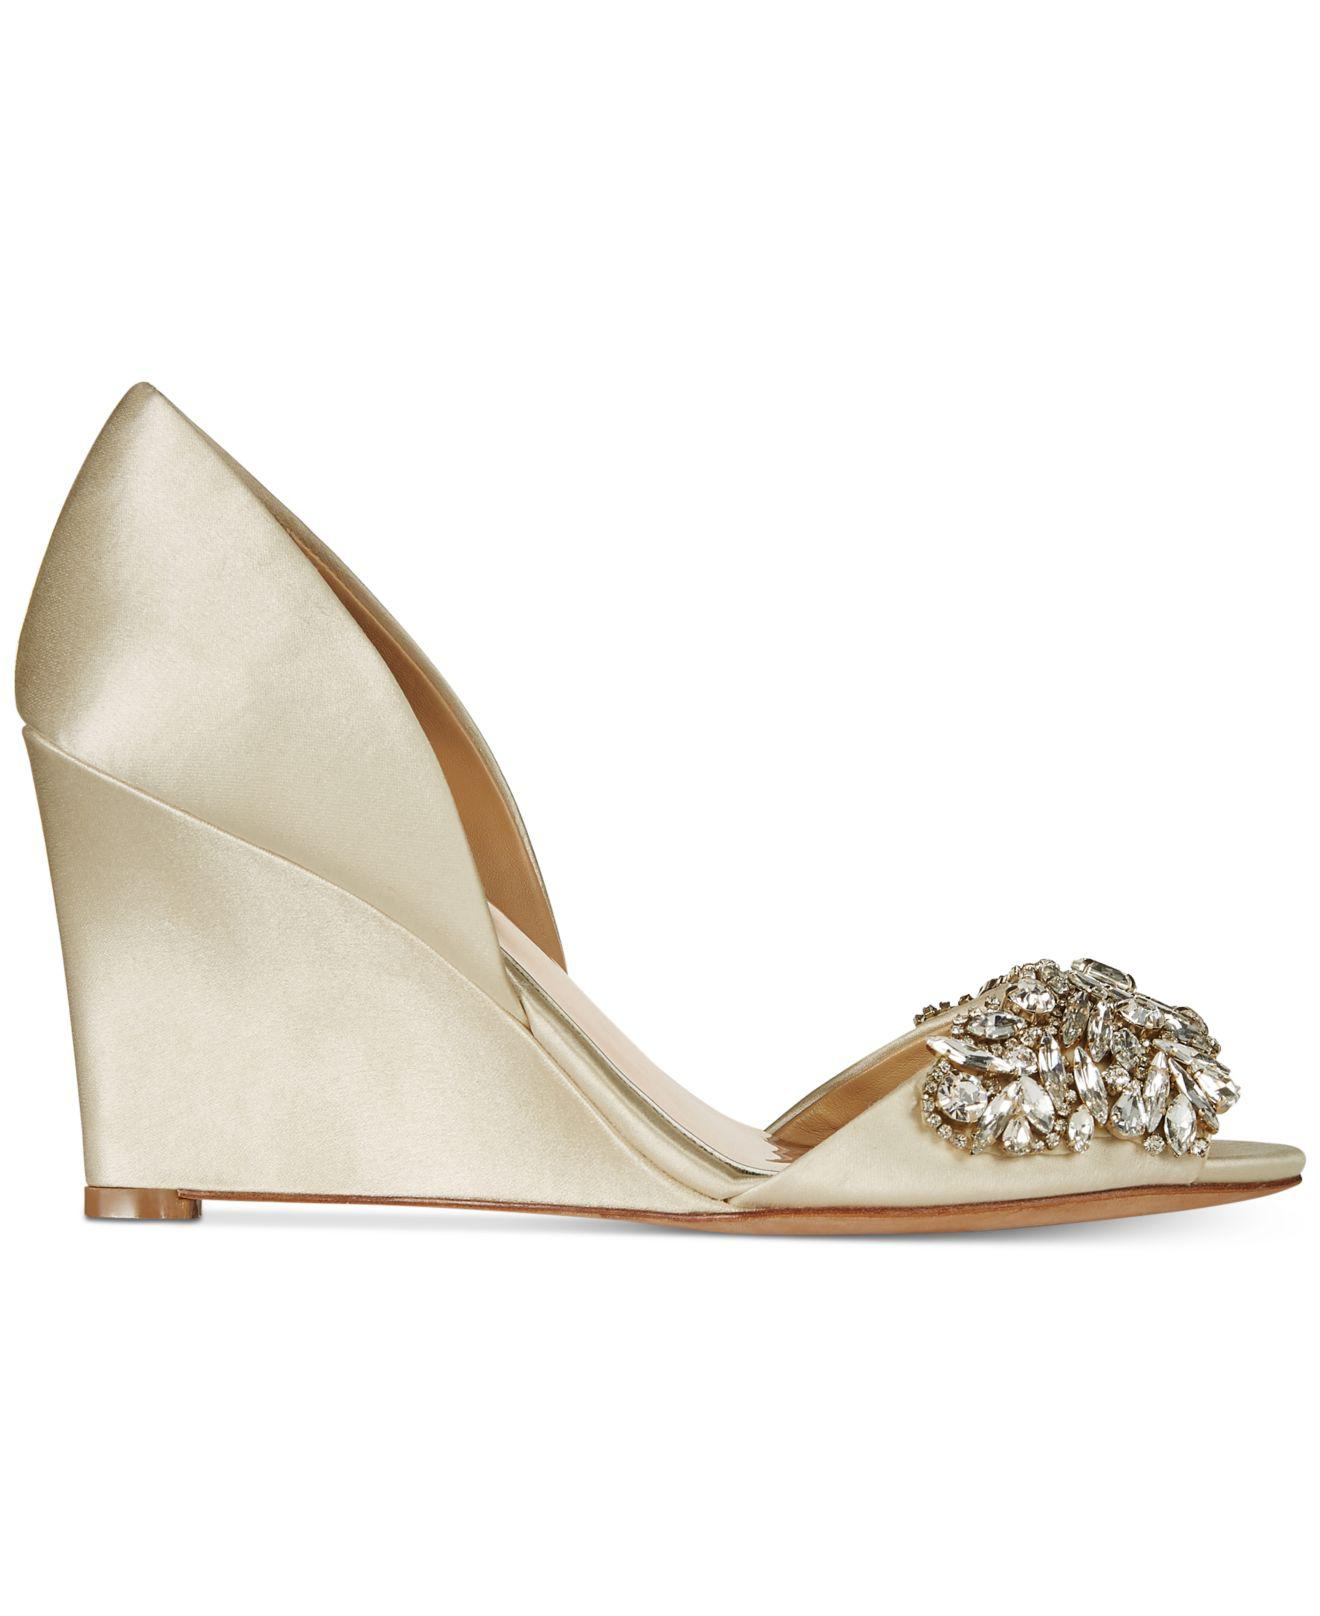 4205e6f3c8 Lyst - Badgley Mischka Hardy Evening Wedge Sandals in White